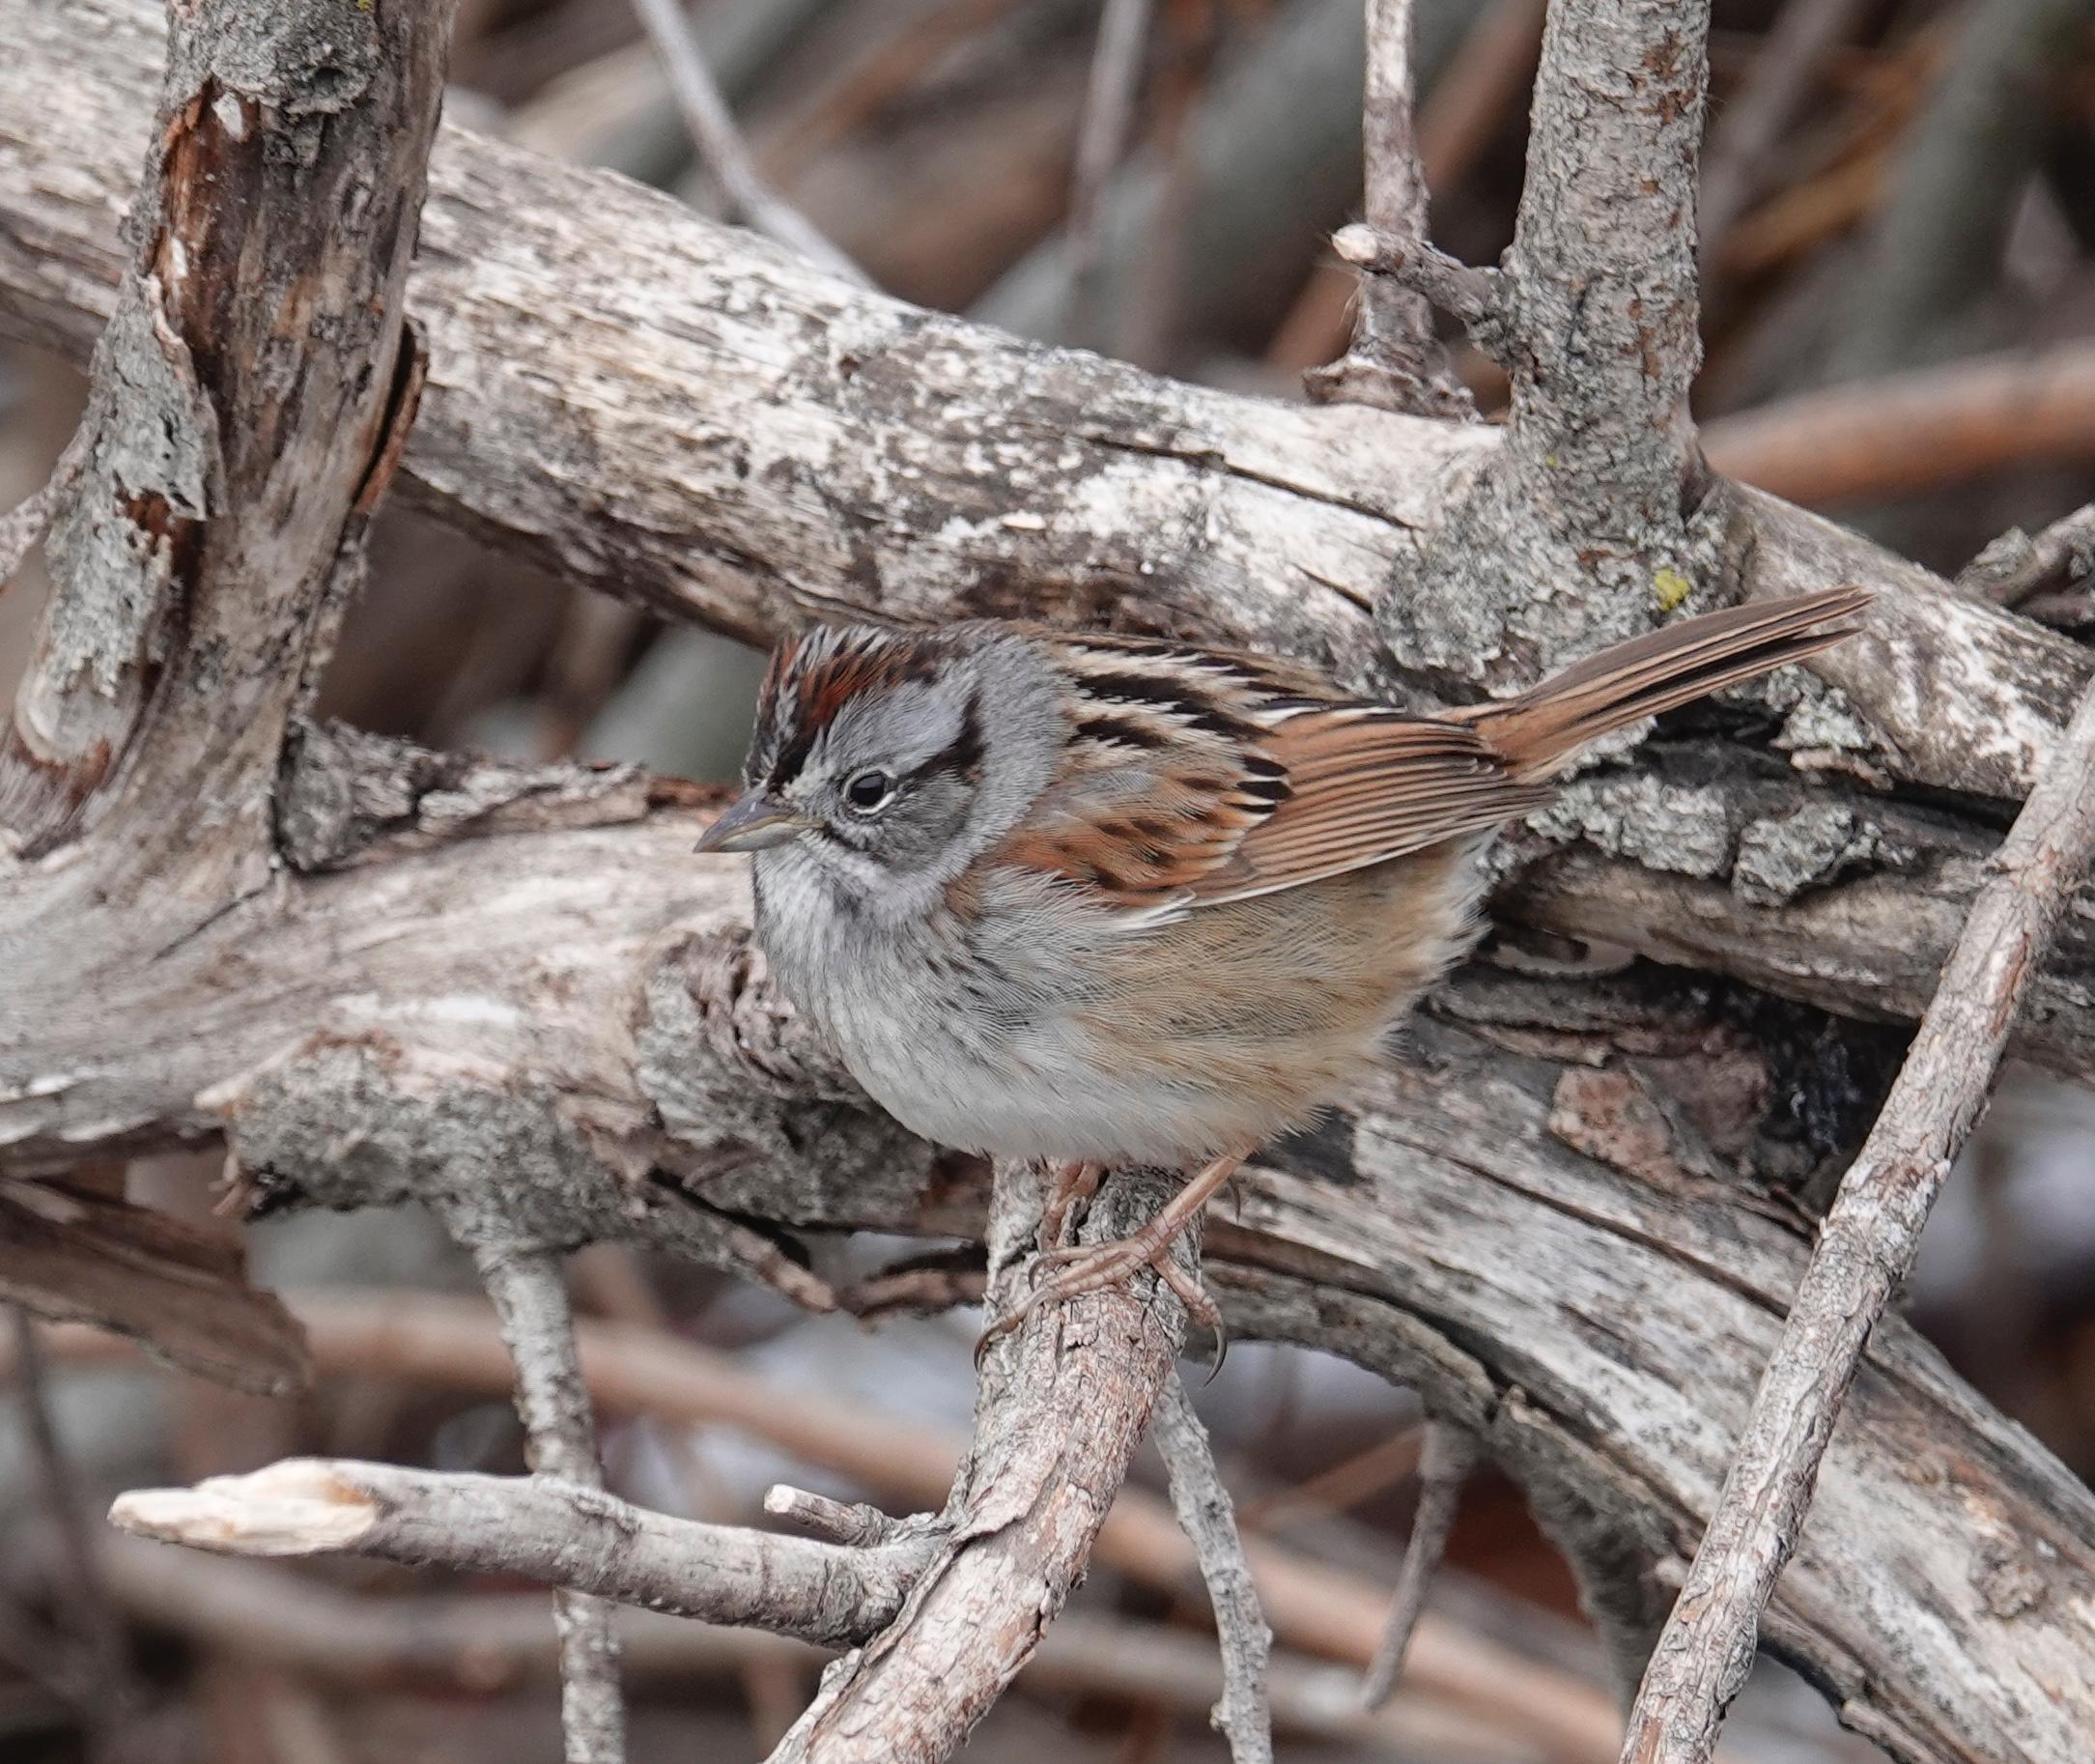 A swamp sparrow is a skulker of swamps and marshes. - Al Batt/Albert Lea Tribune